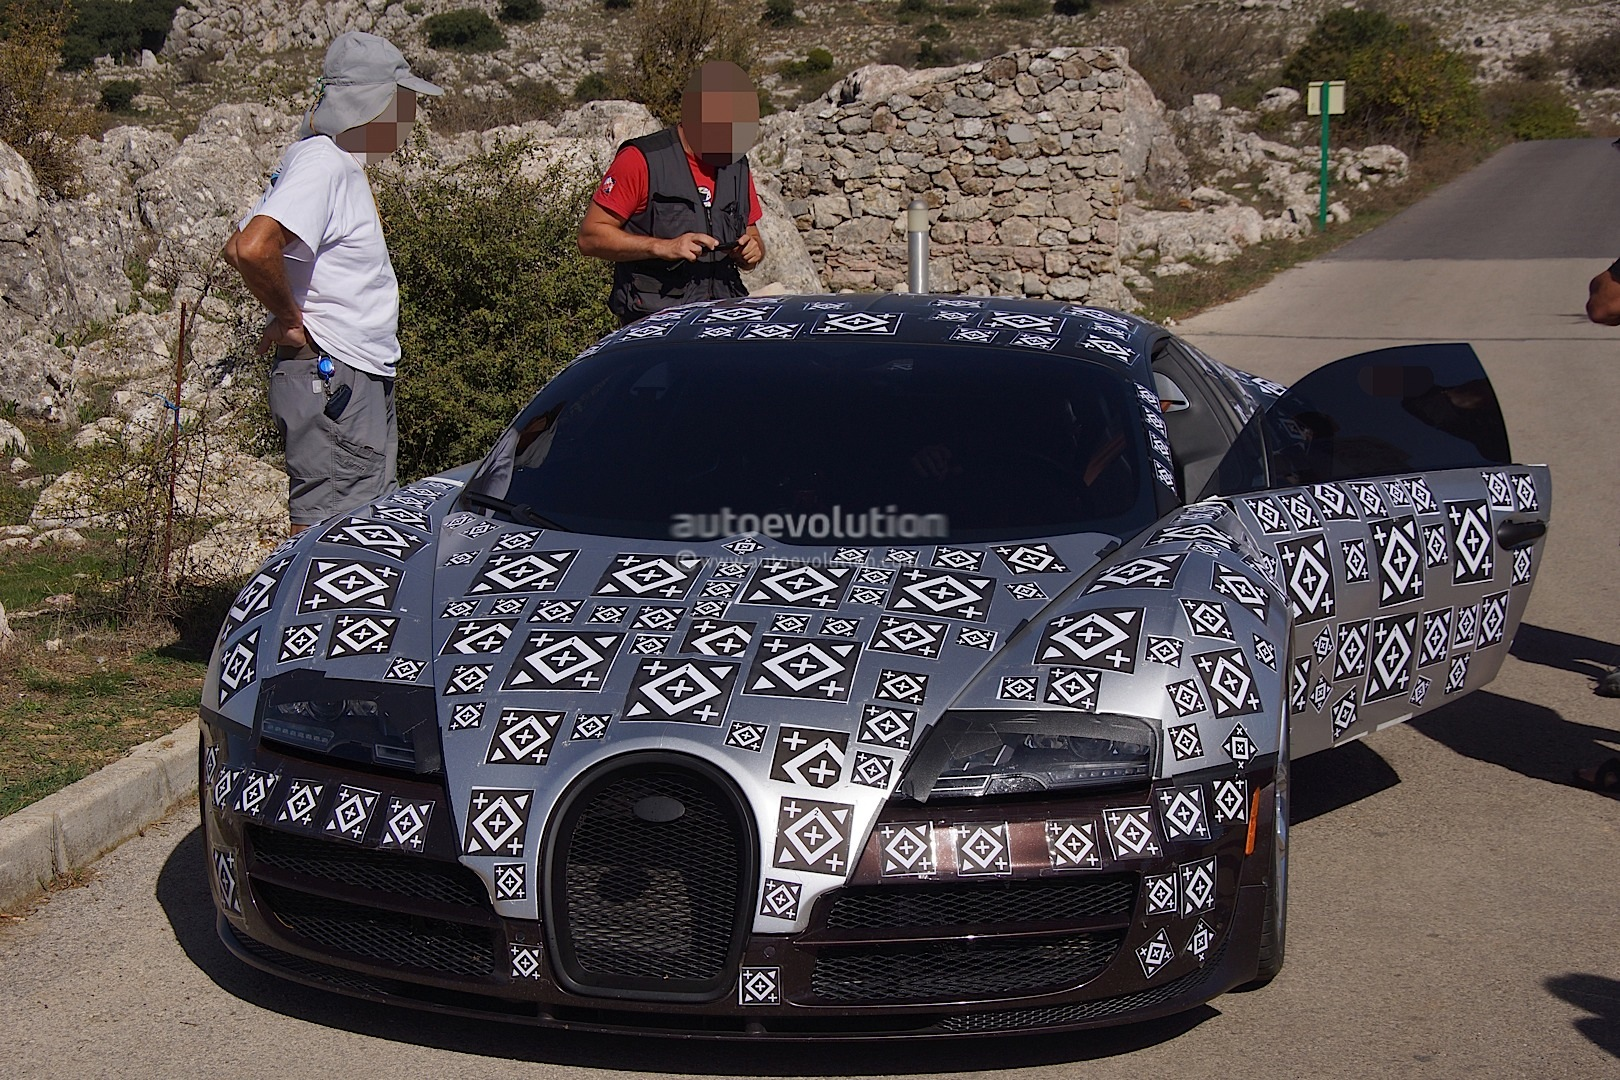 W16 Engine With 1200 Horsepower Bugatti Veyron Diagram